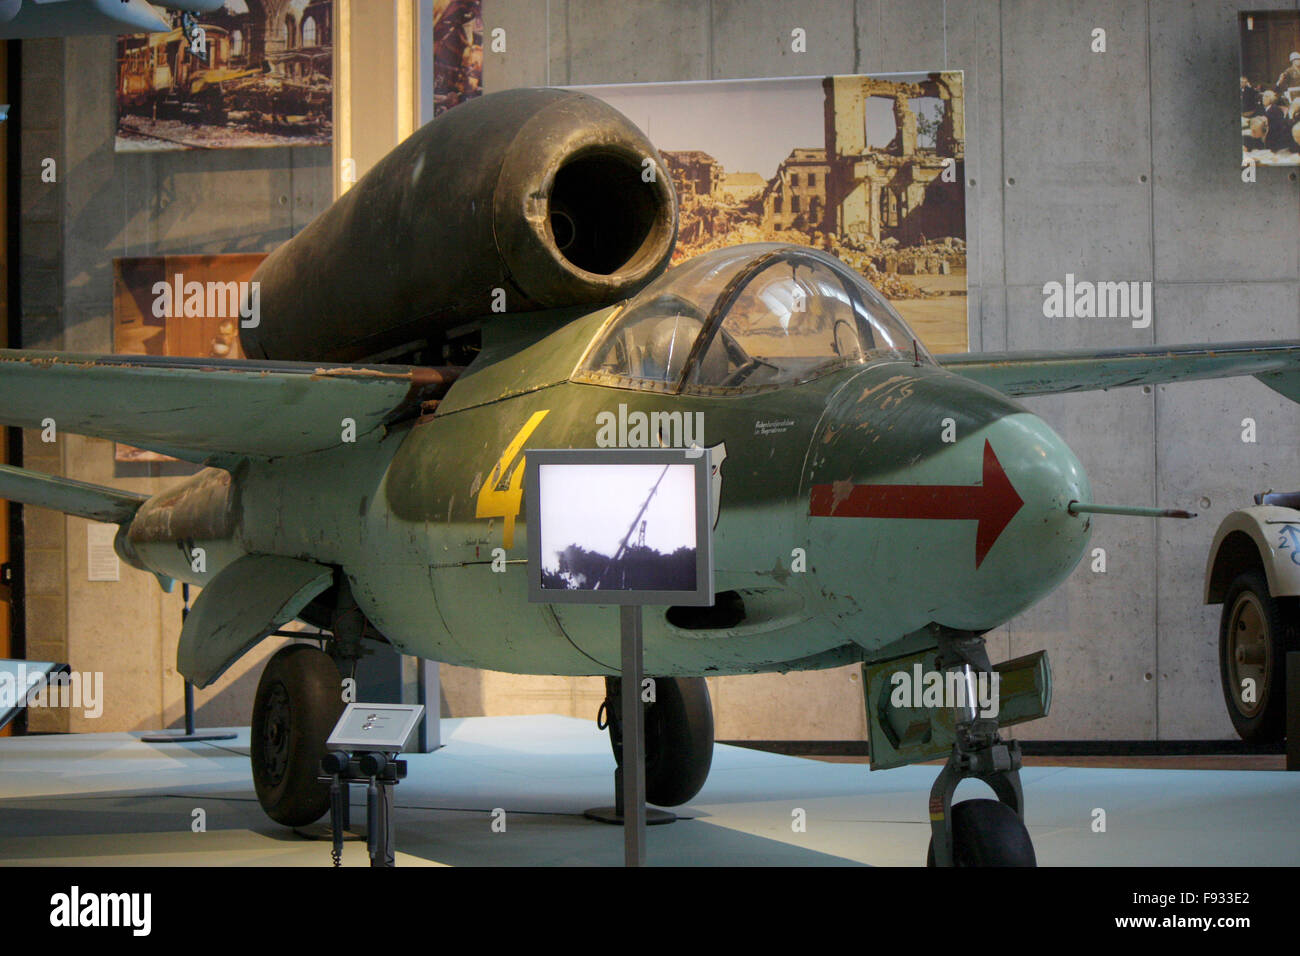 historisches Kampfflugzeug - Deutsches Technikmuseum, Berlin-Kreuzberg. - Stock Image